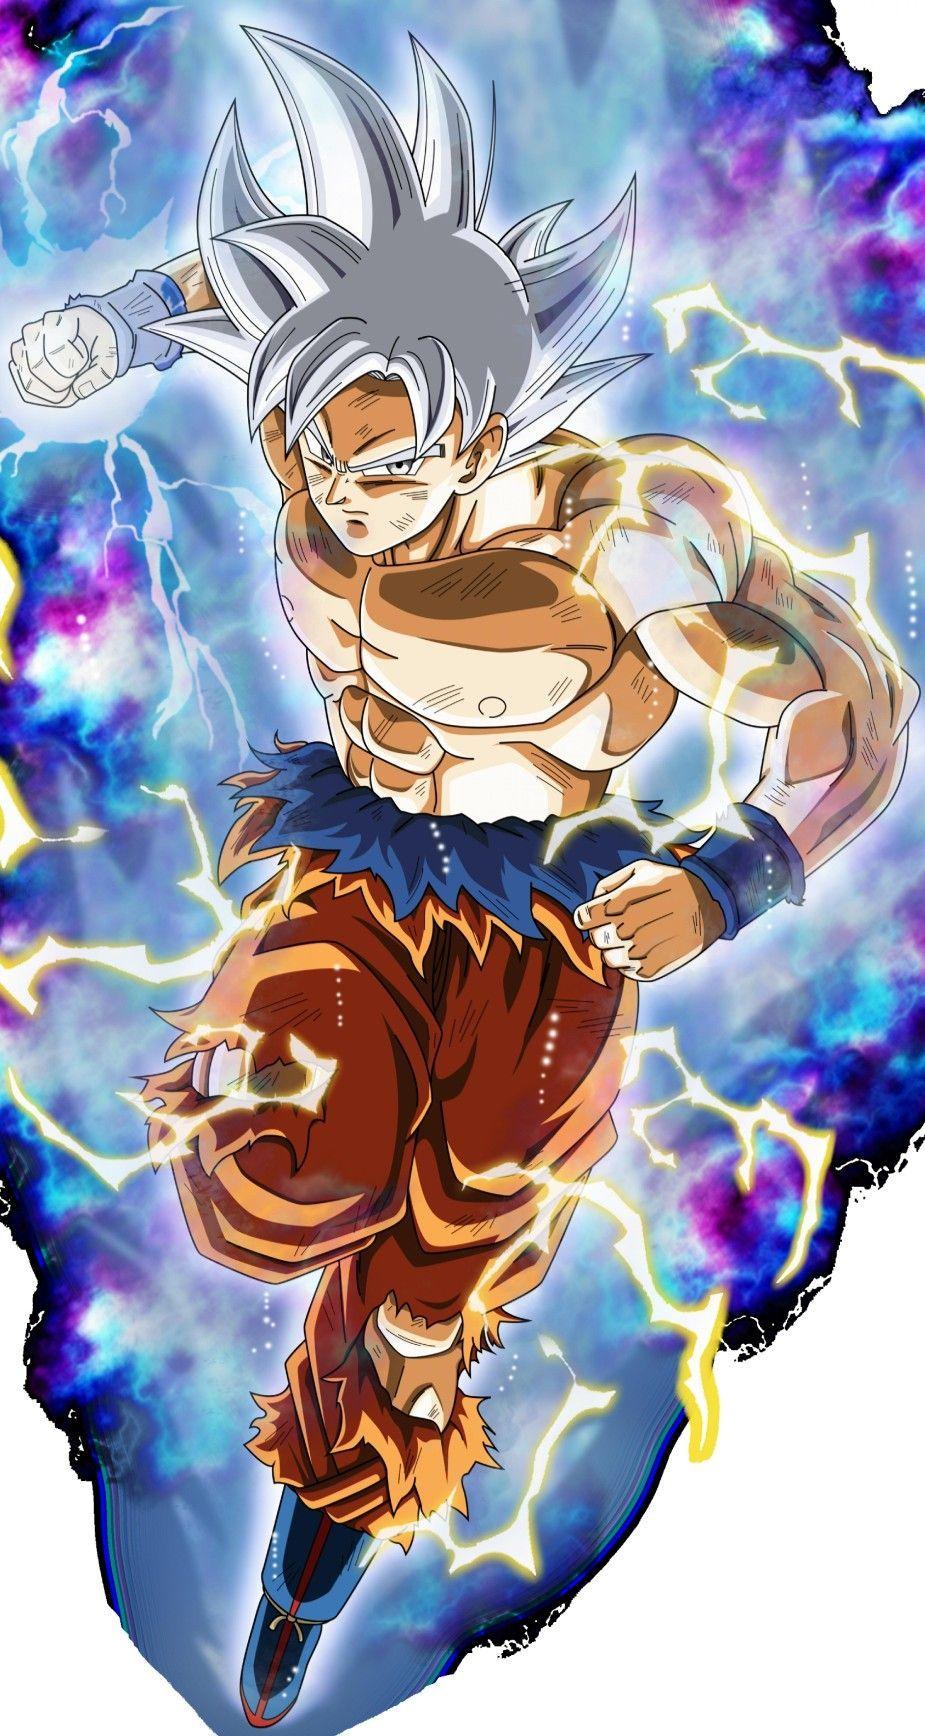 Goku Ultra Instinto Dominado Universo 7 Dragon Ball Wallpaper Iphone Anime Dragon Ball Super Anime Dragon Ball Goku